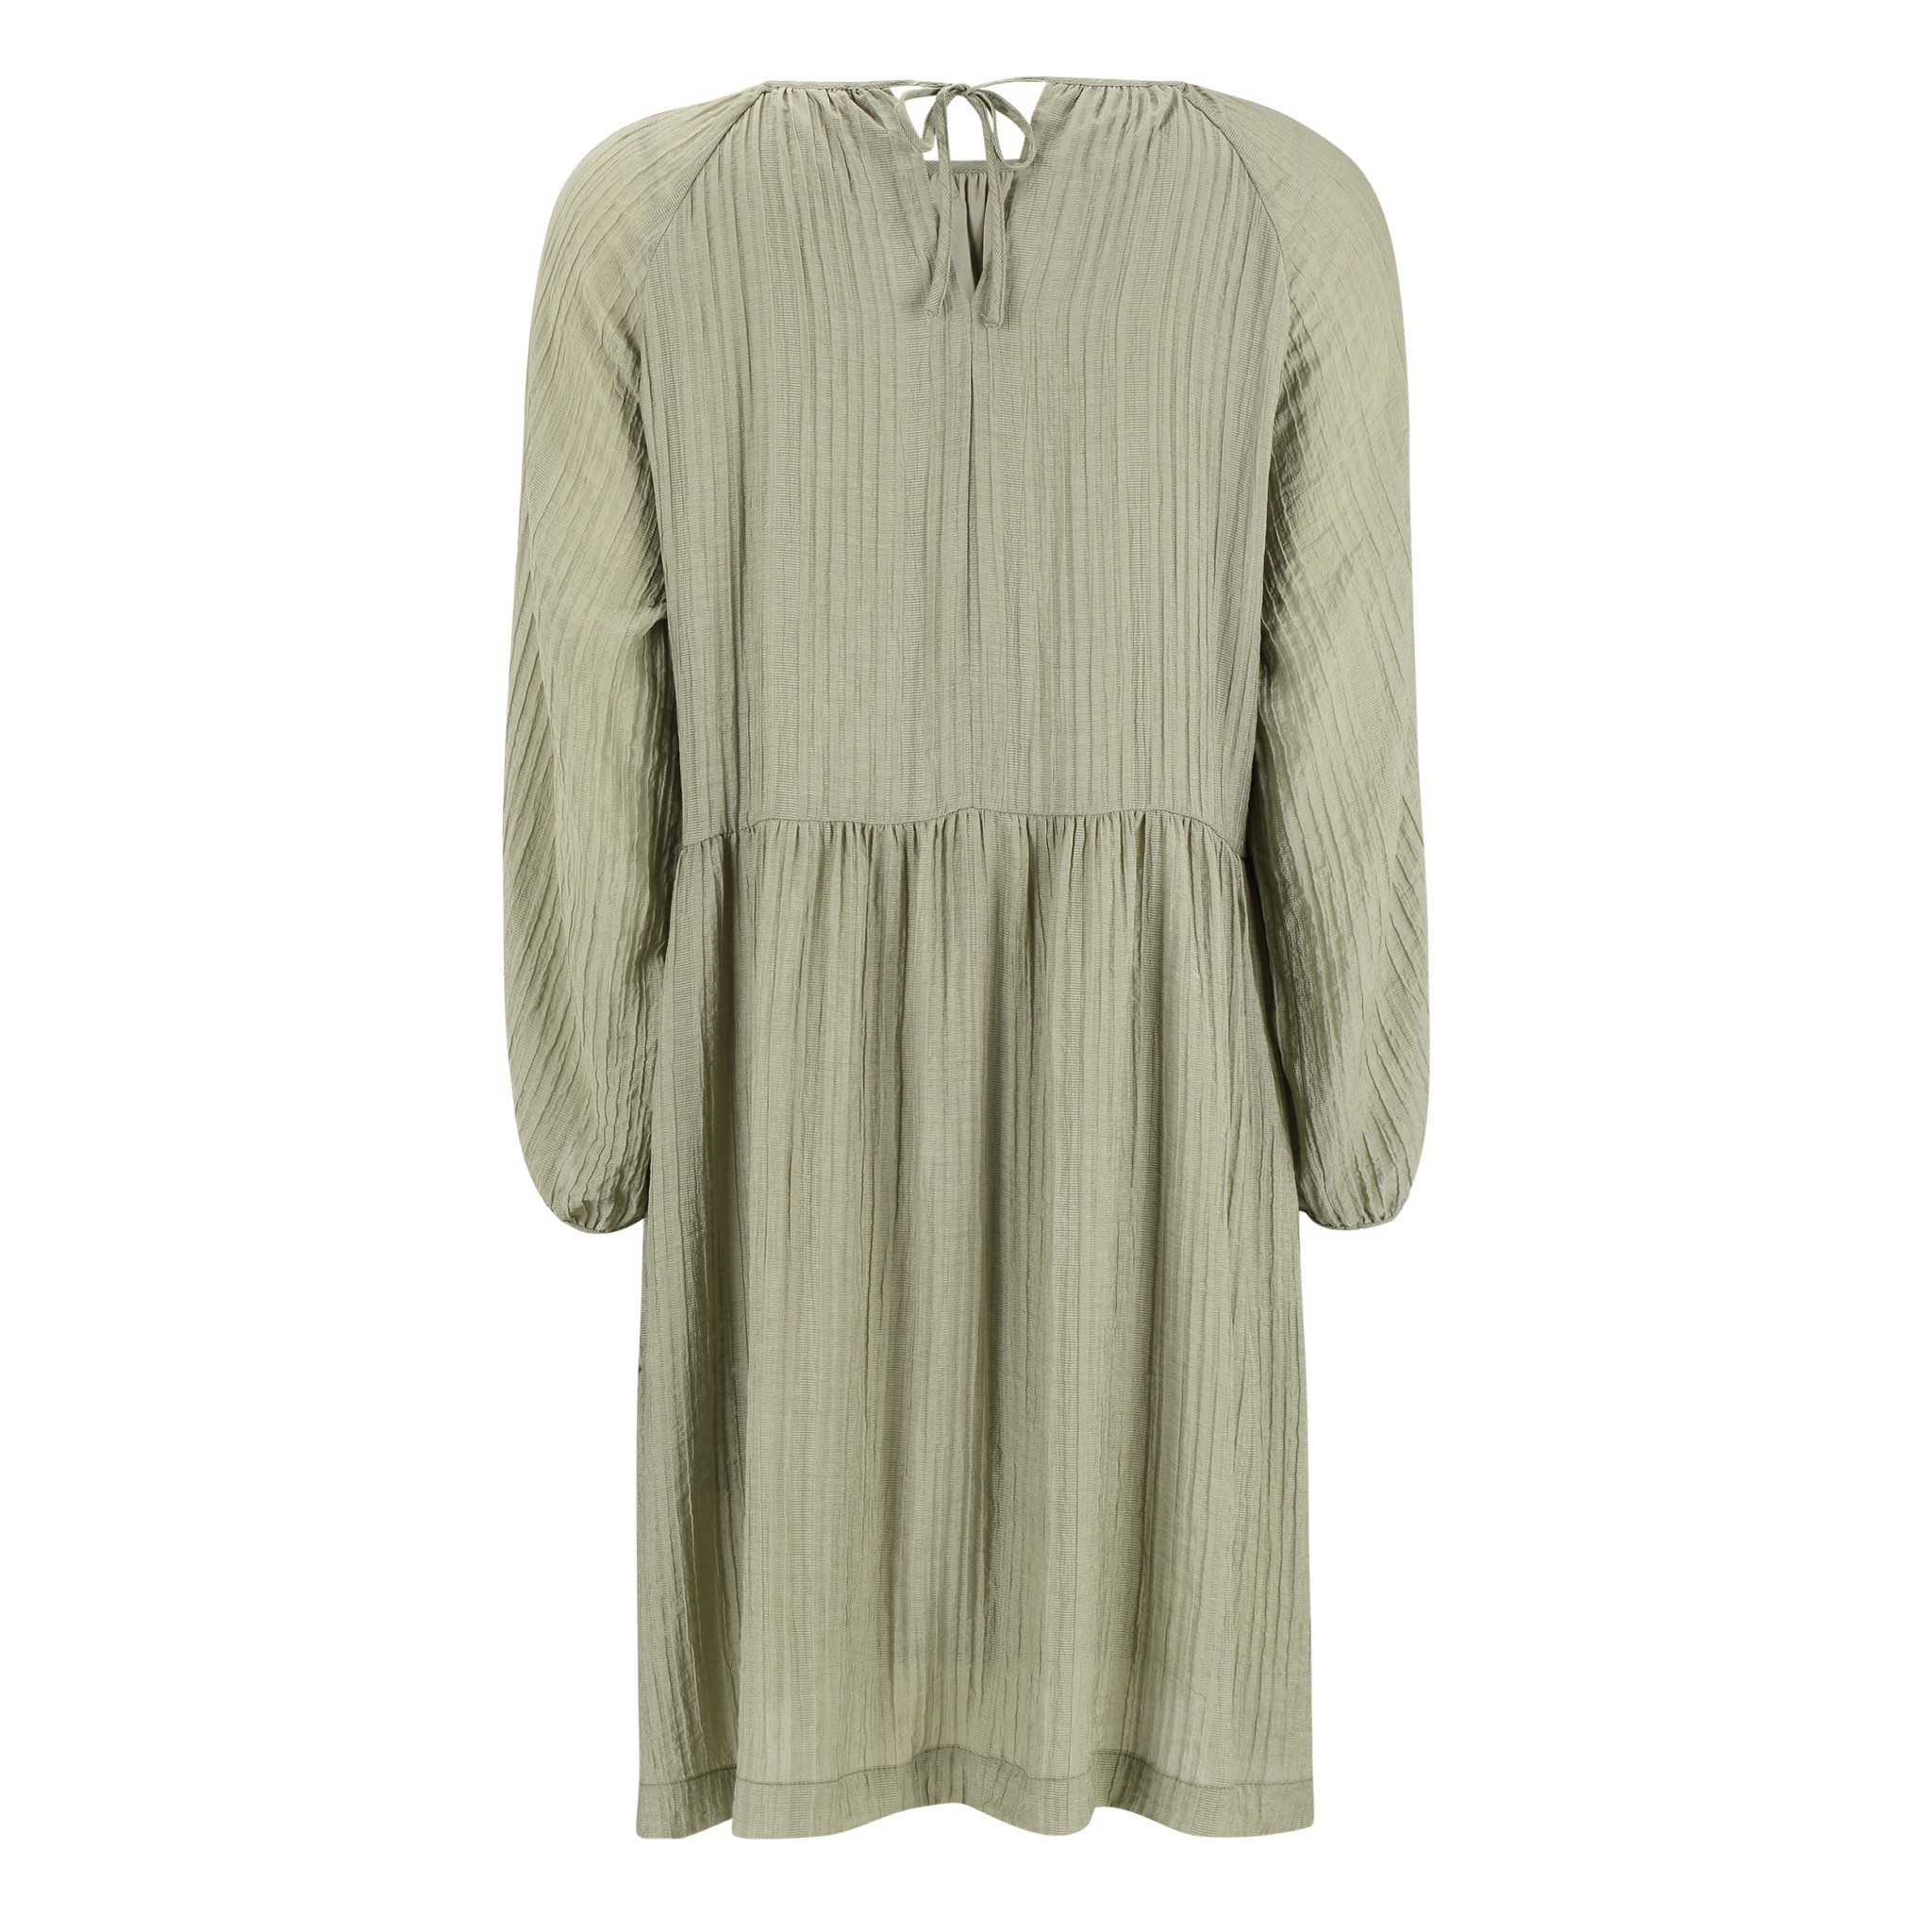 Soft Rebels Polly Dress